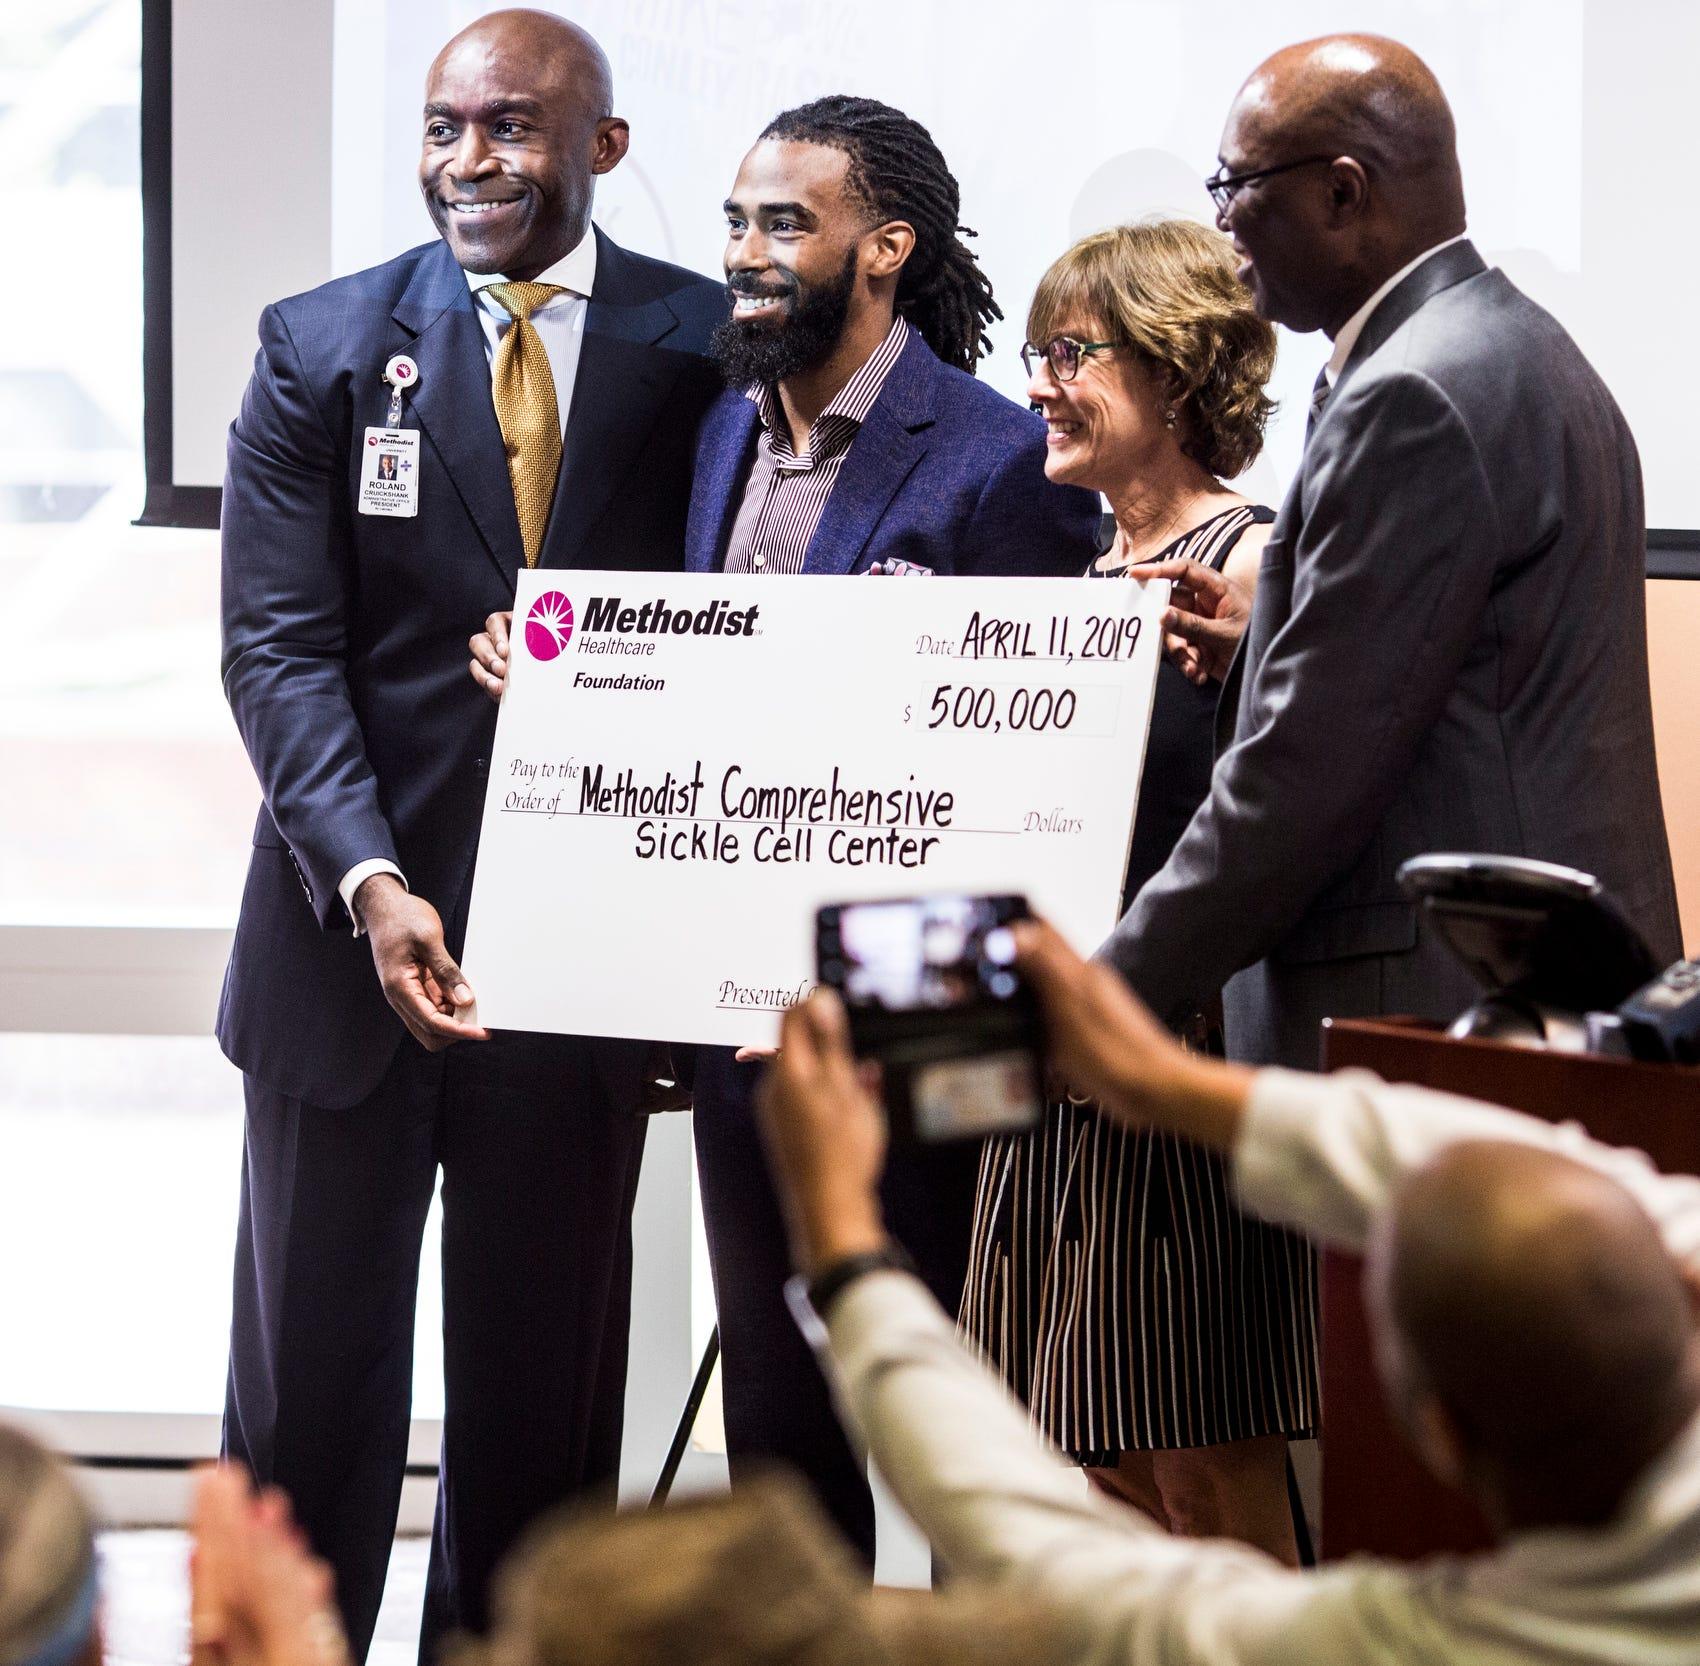 Memphis Grizzlies' Mike Conley donates $500K to Methodist sickle cell center